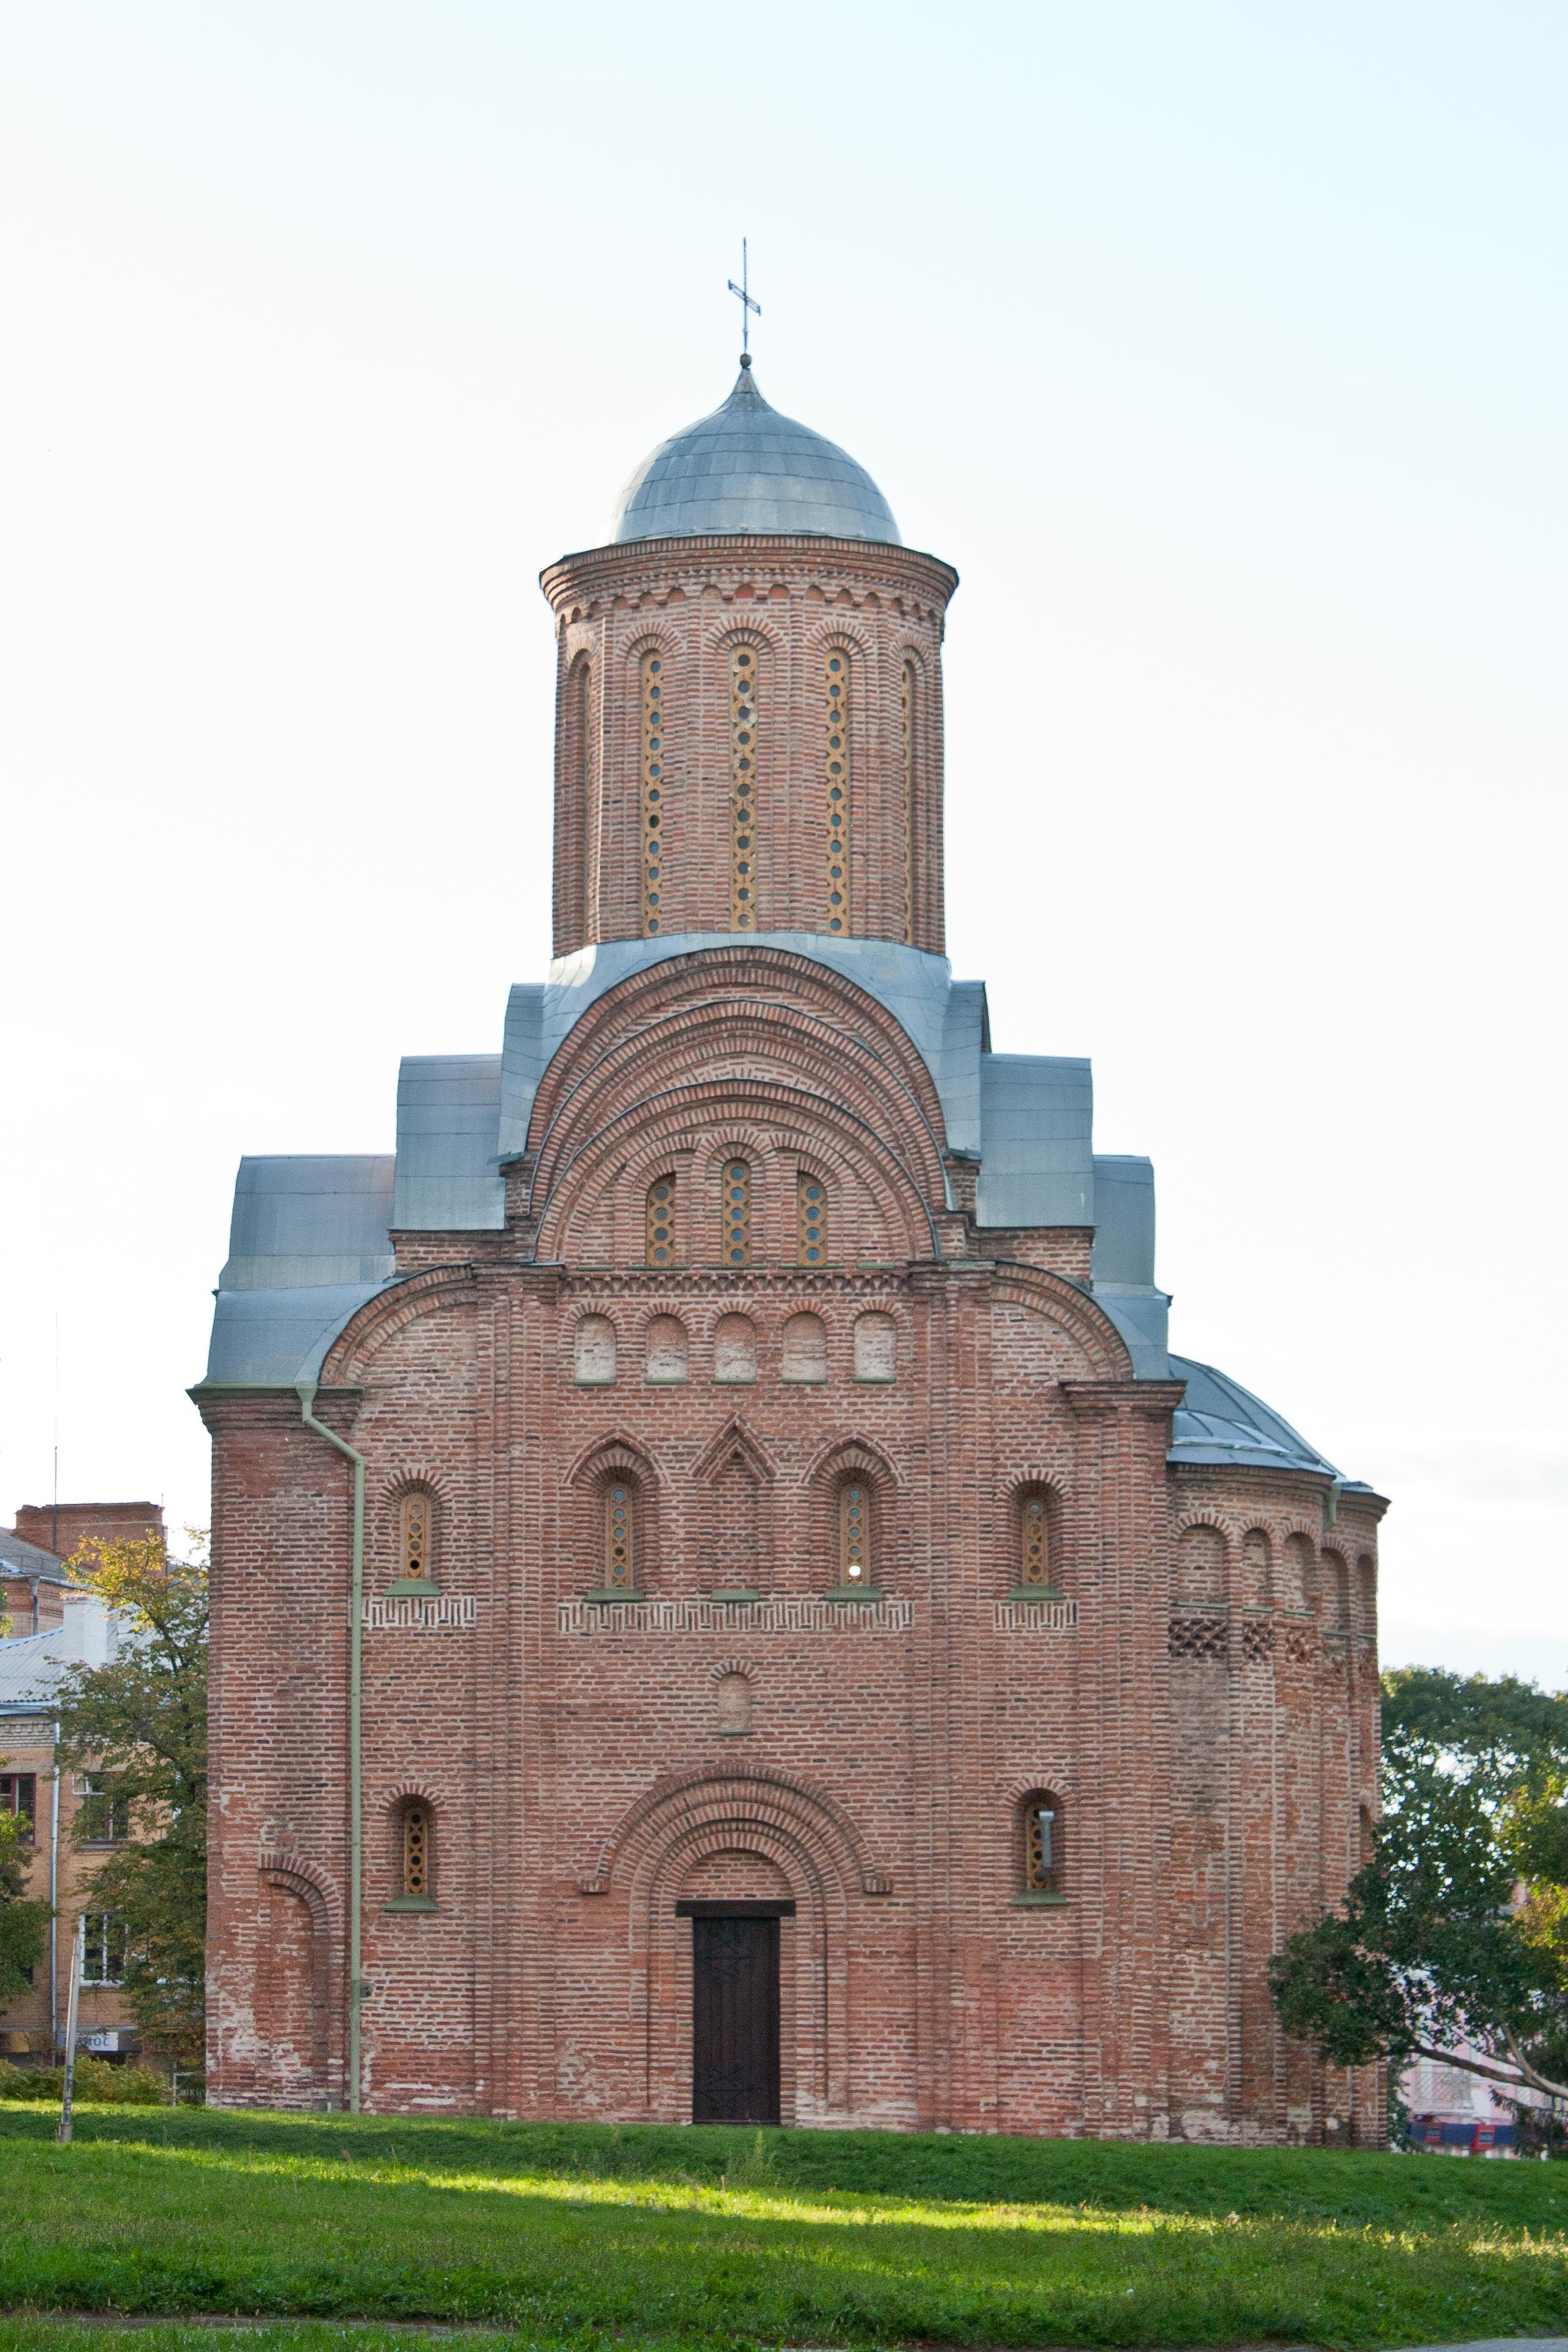 File:П'ятницька церква - Чернігів 3.jpg - Wikimedia Commons